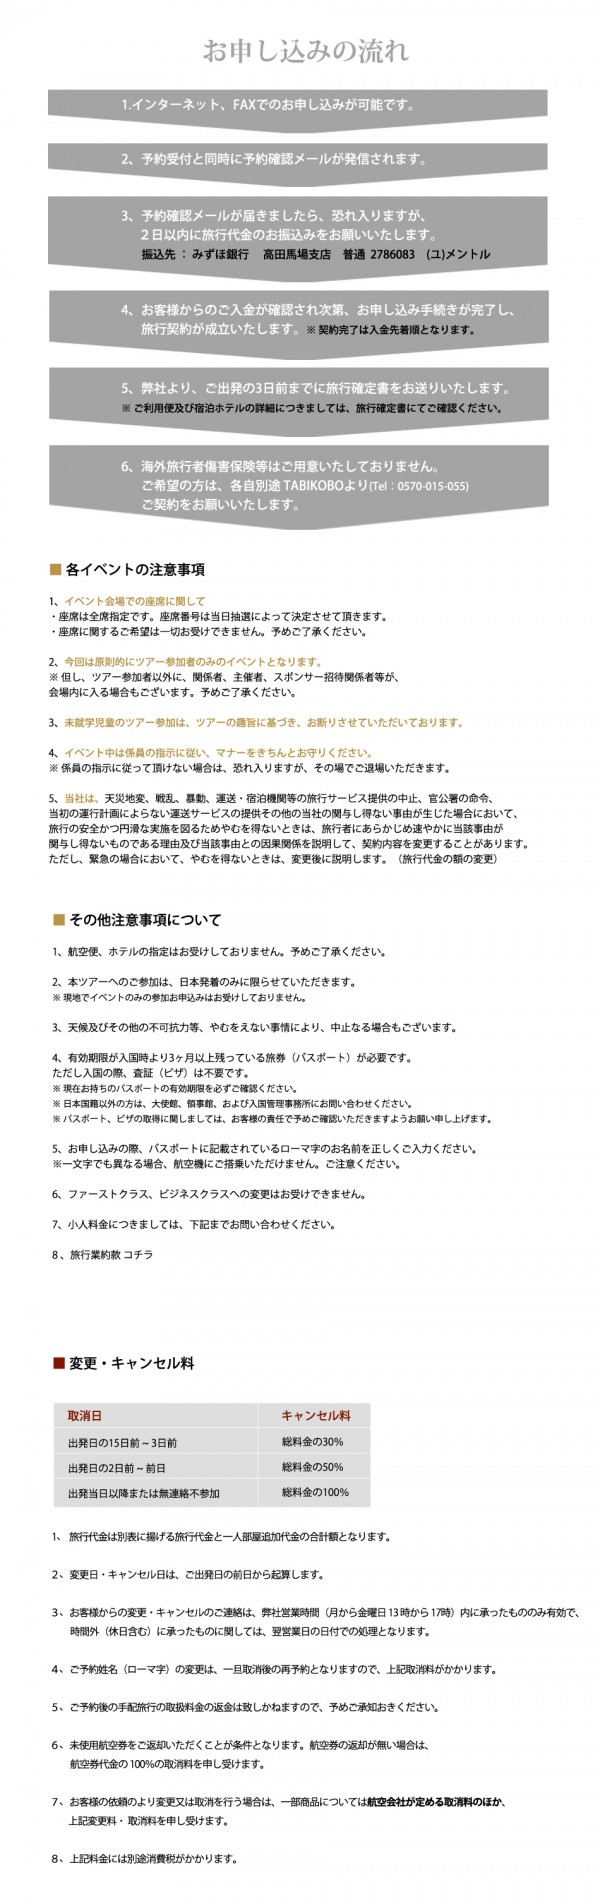 sihoo_2014_42.jpg